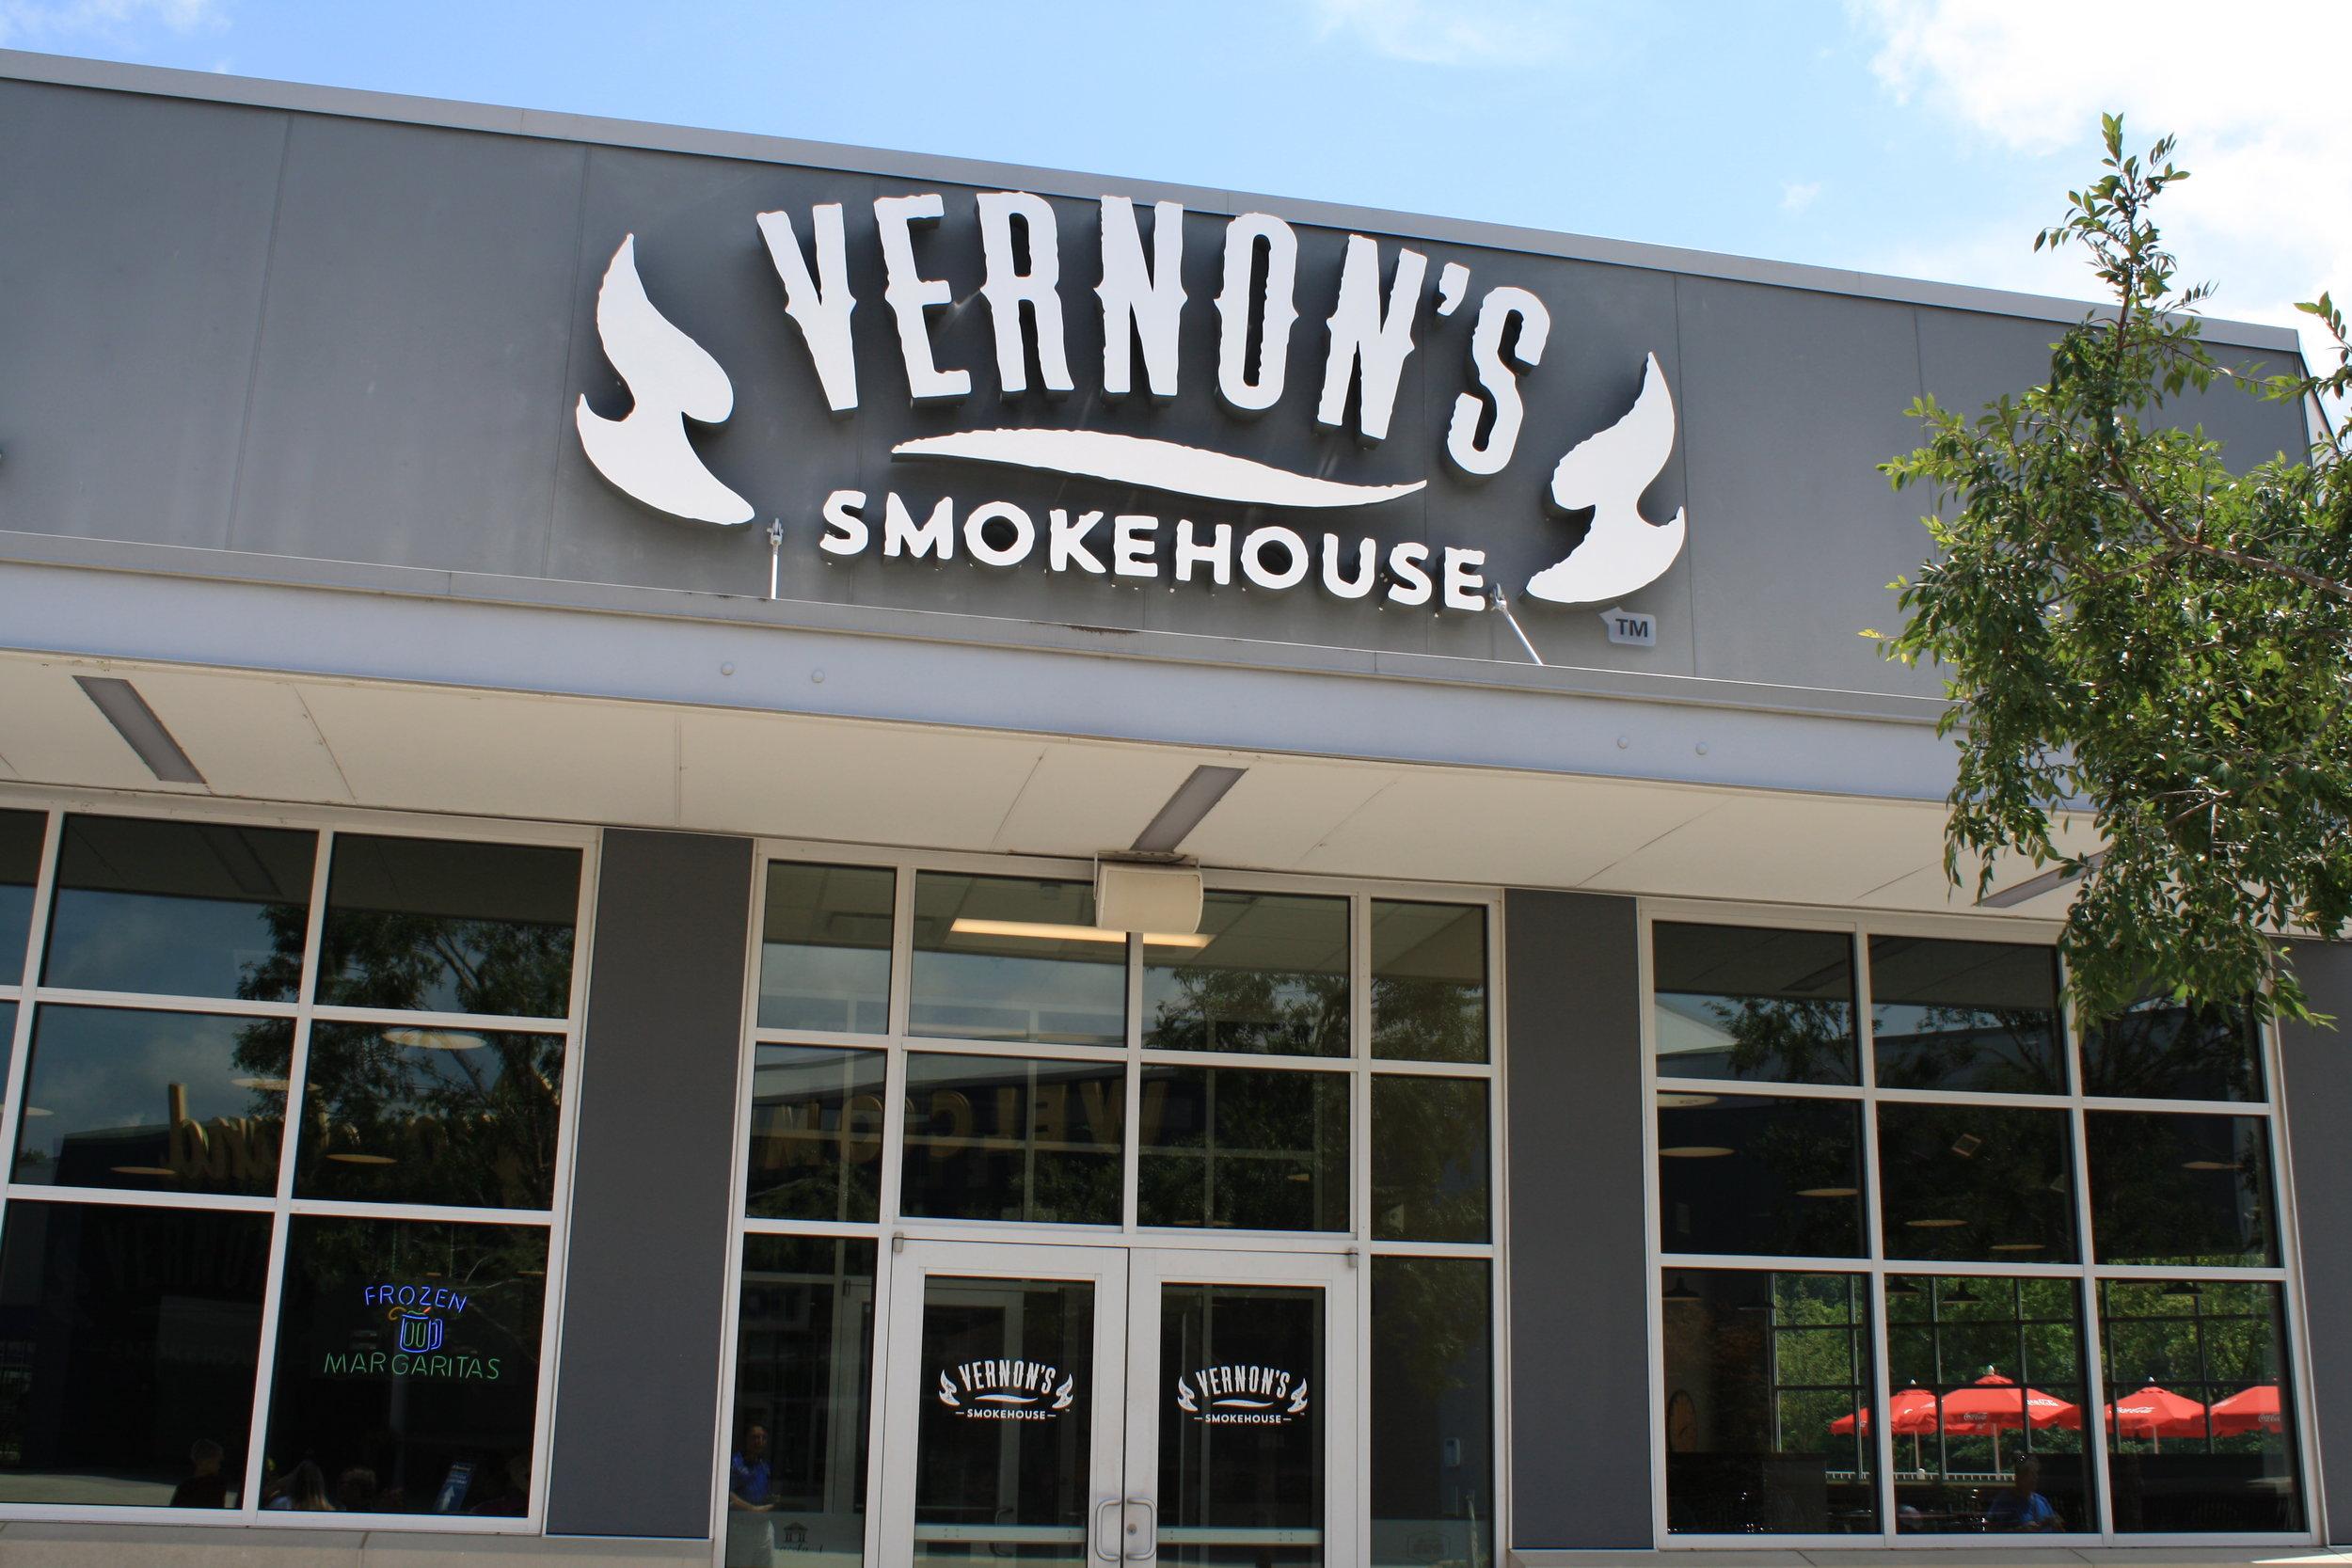 Graceland_Vernon's-Smokehouse_LSIGraphics_Memphis-TN-1 ..